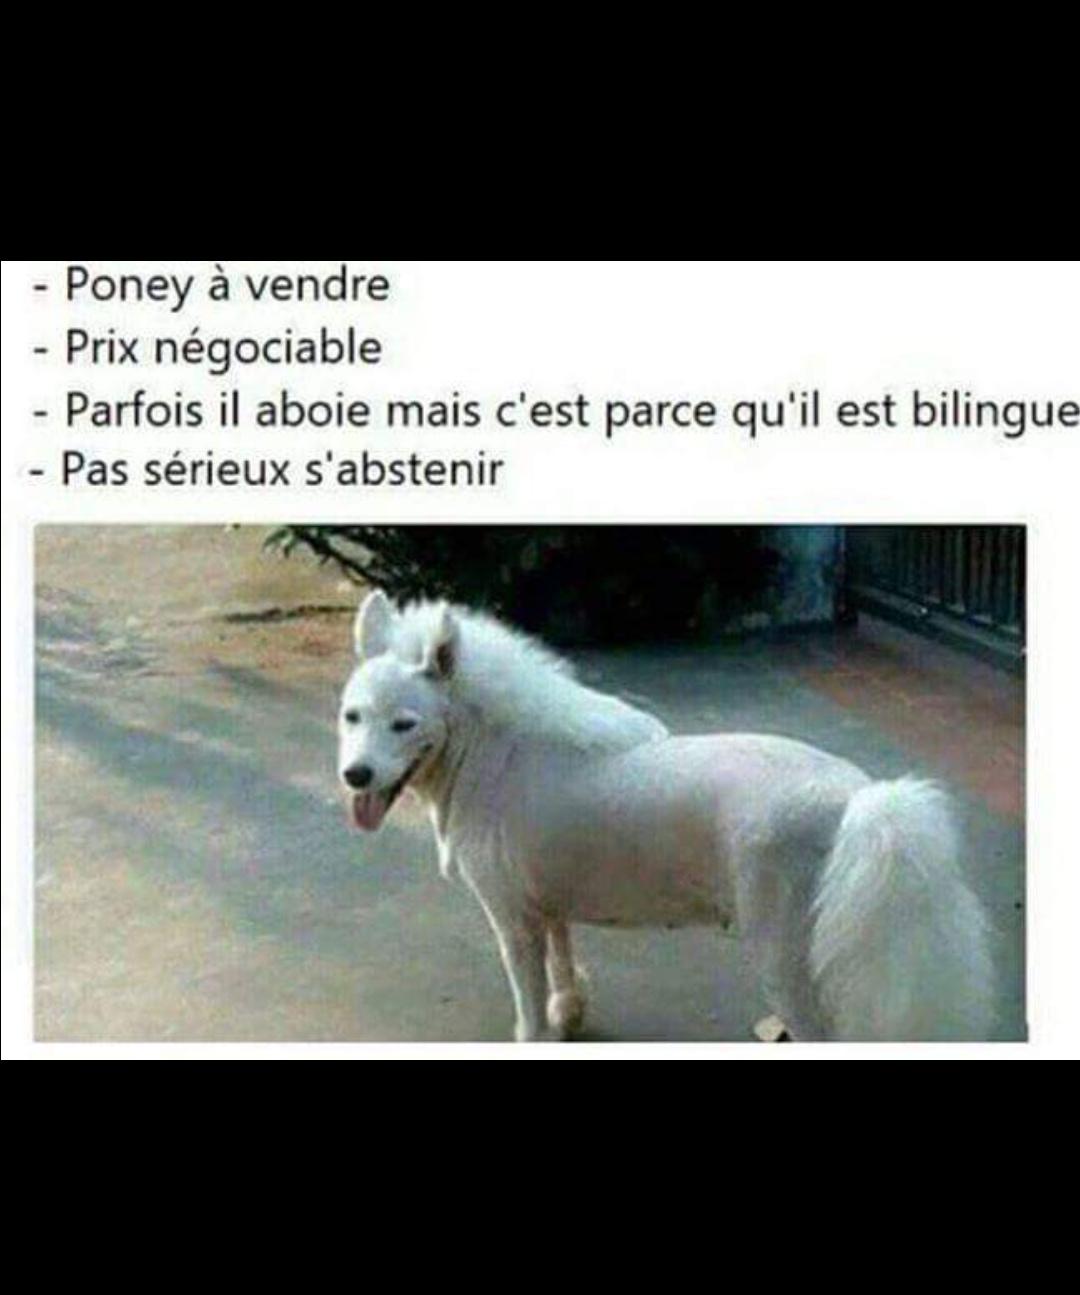 Le poney de bob. - meme